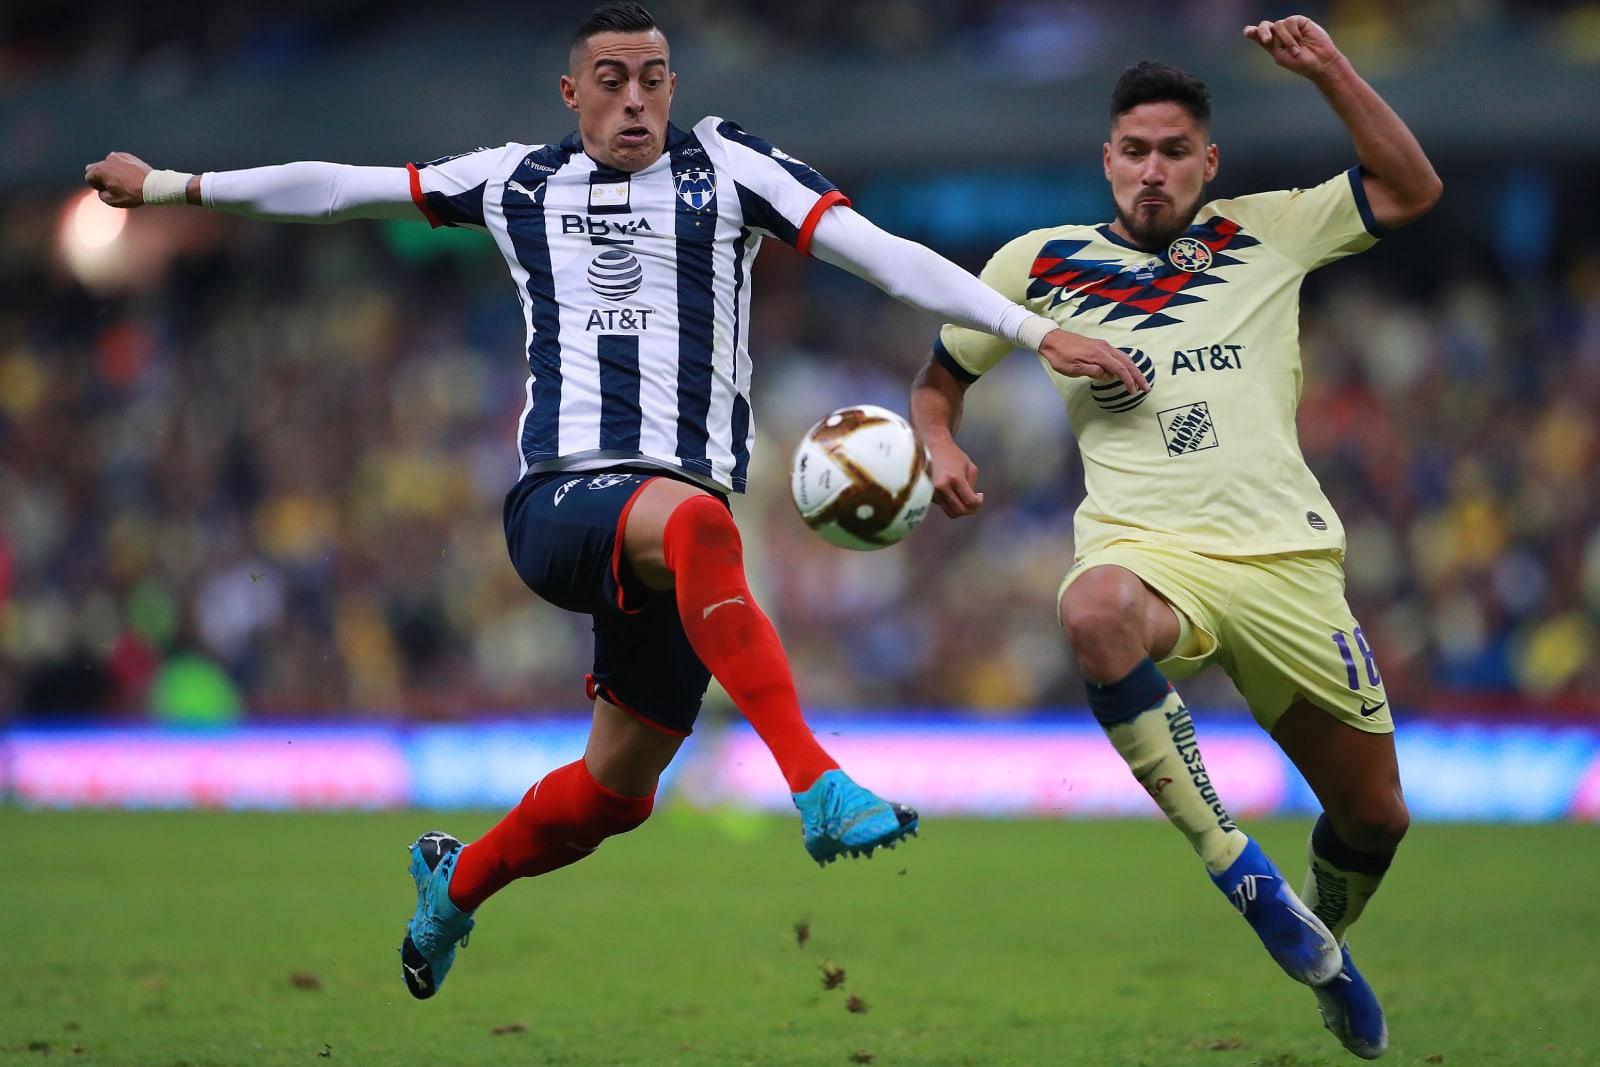 Liga MX Matchday 2